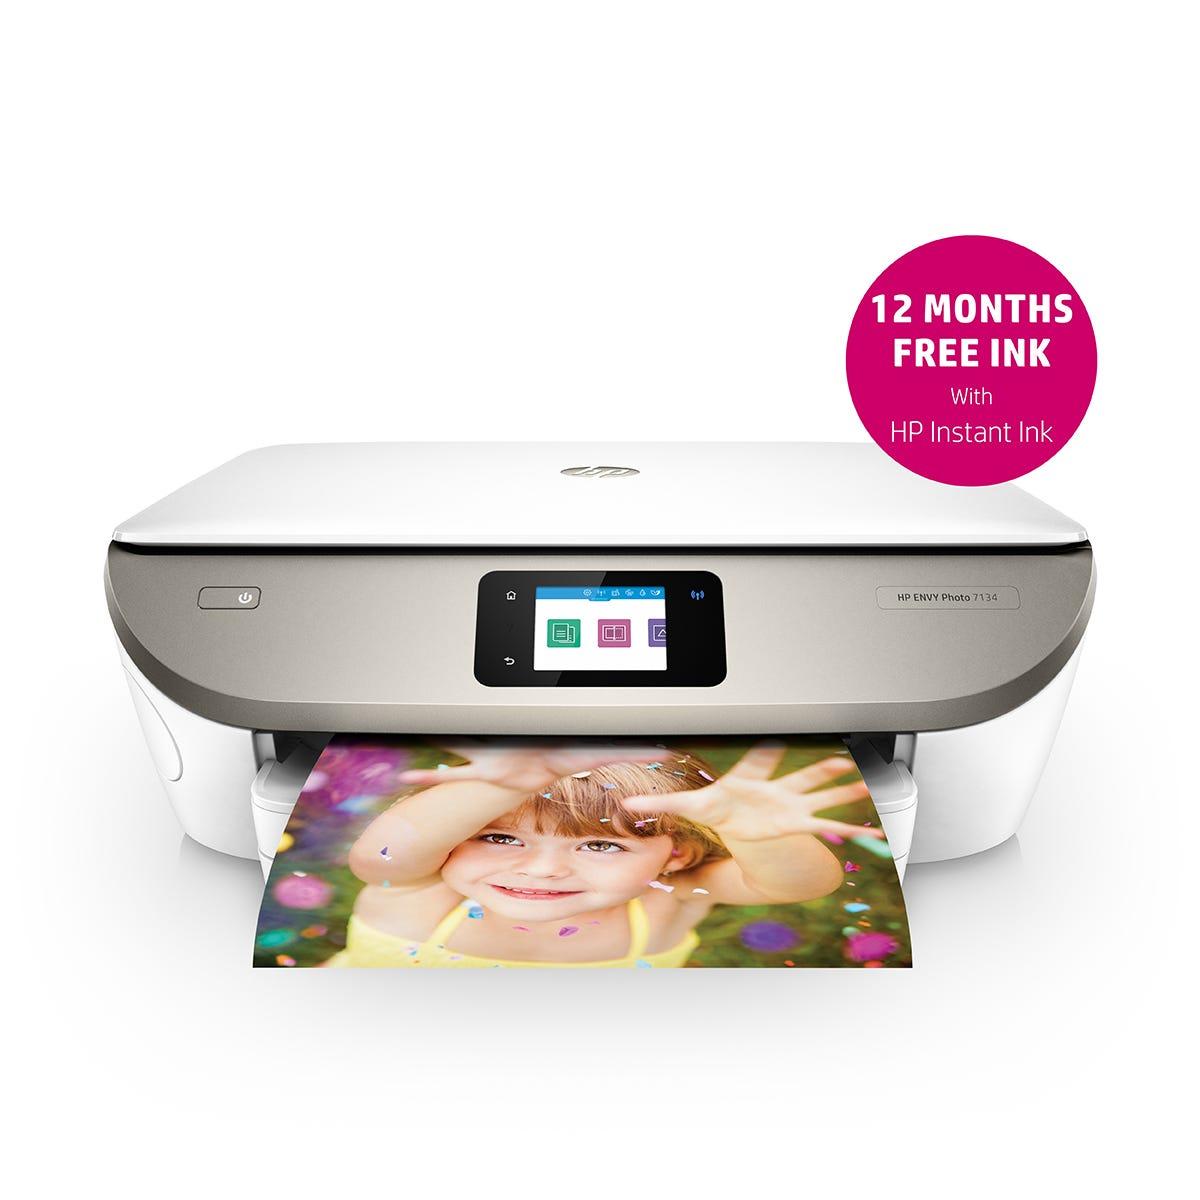 HP Envy Photo Plus 7134 All-in-one Printer/Scanner